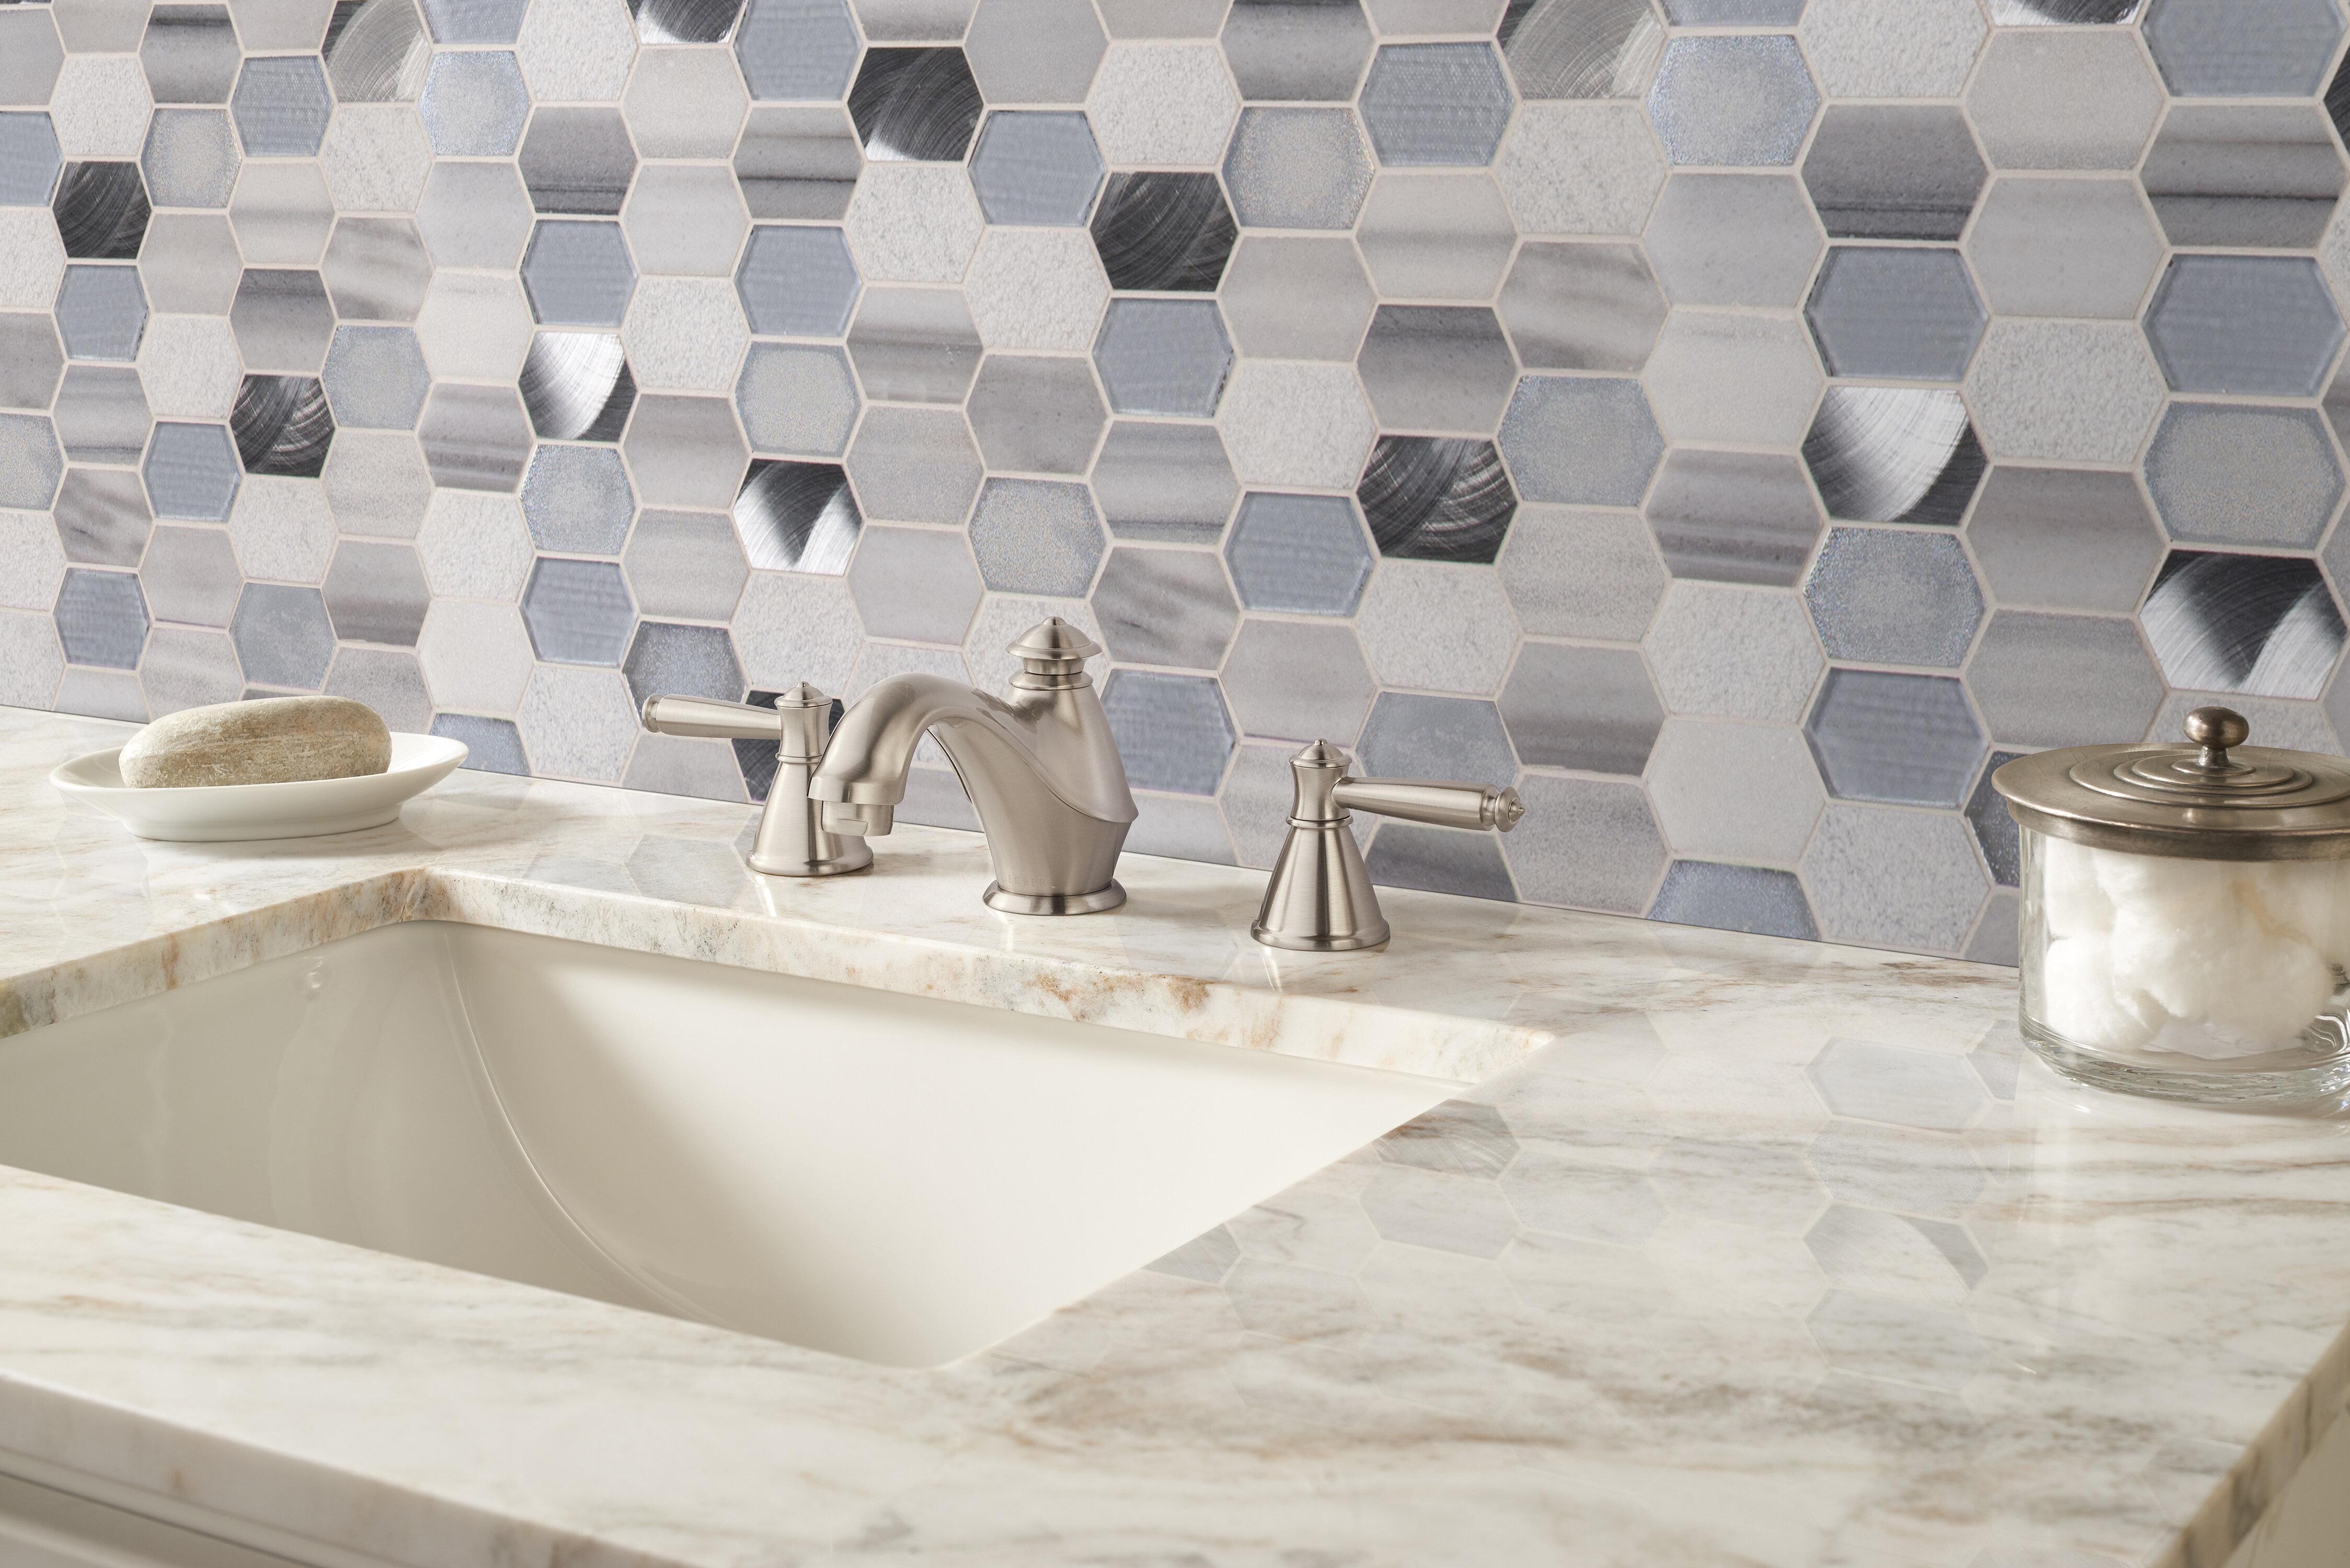 Phenomenal Harlow Picket Glass Stone Mosaic Tile In Gray Download Free Architecture Designs Scobabritishbridgeorg